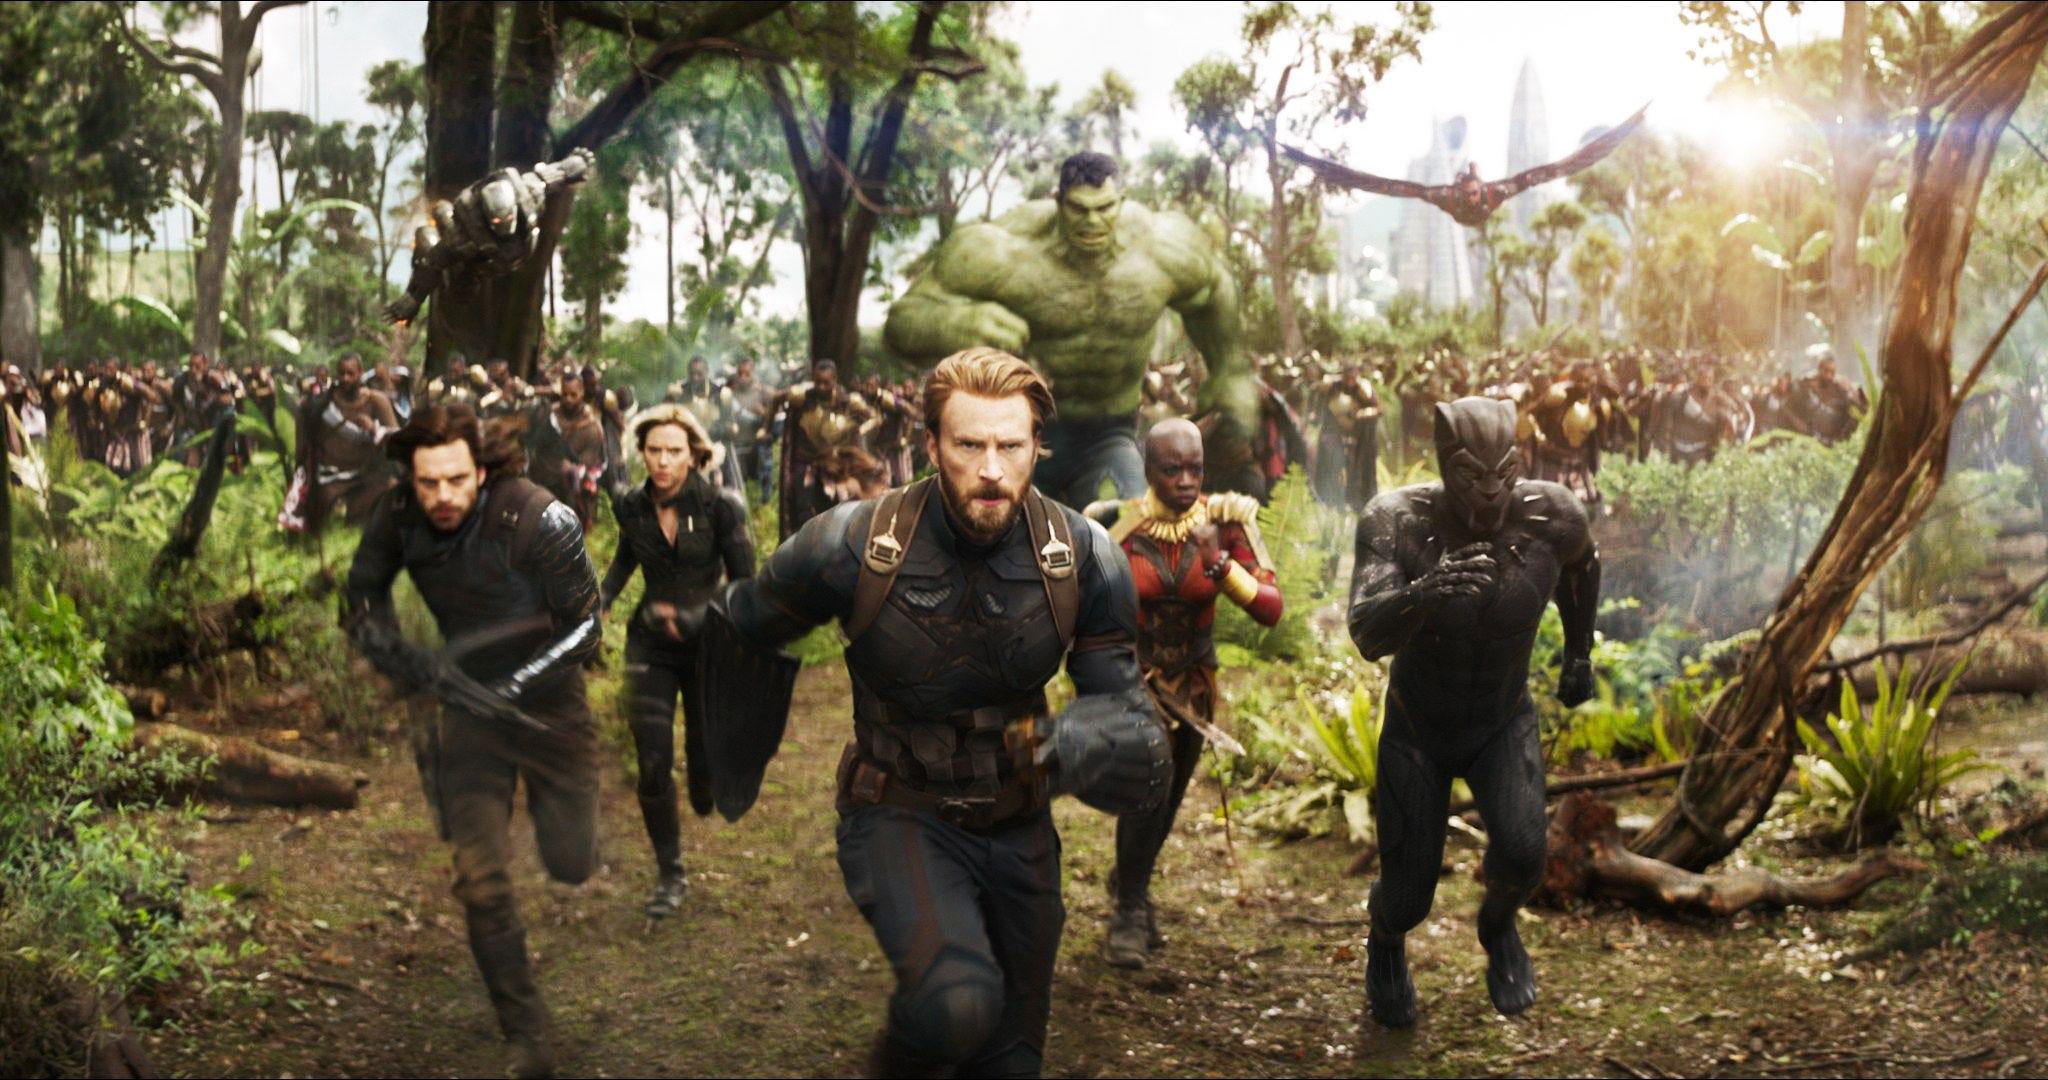 A movie still from Marvel's Avengers: Infinity War